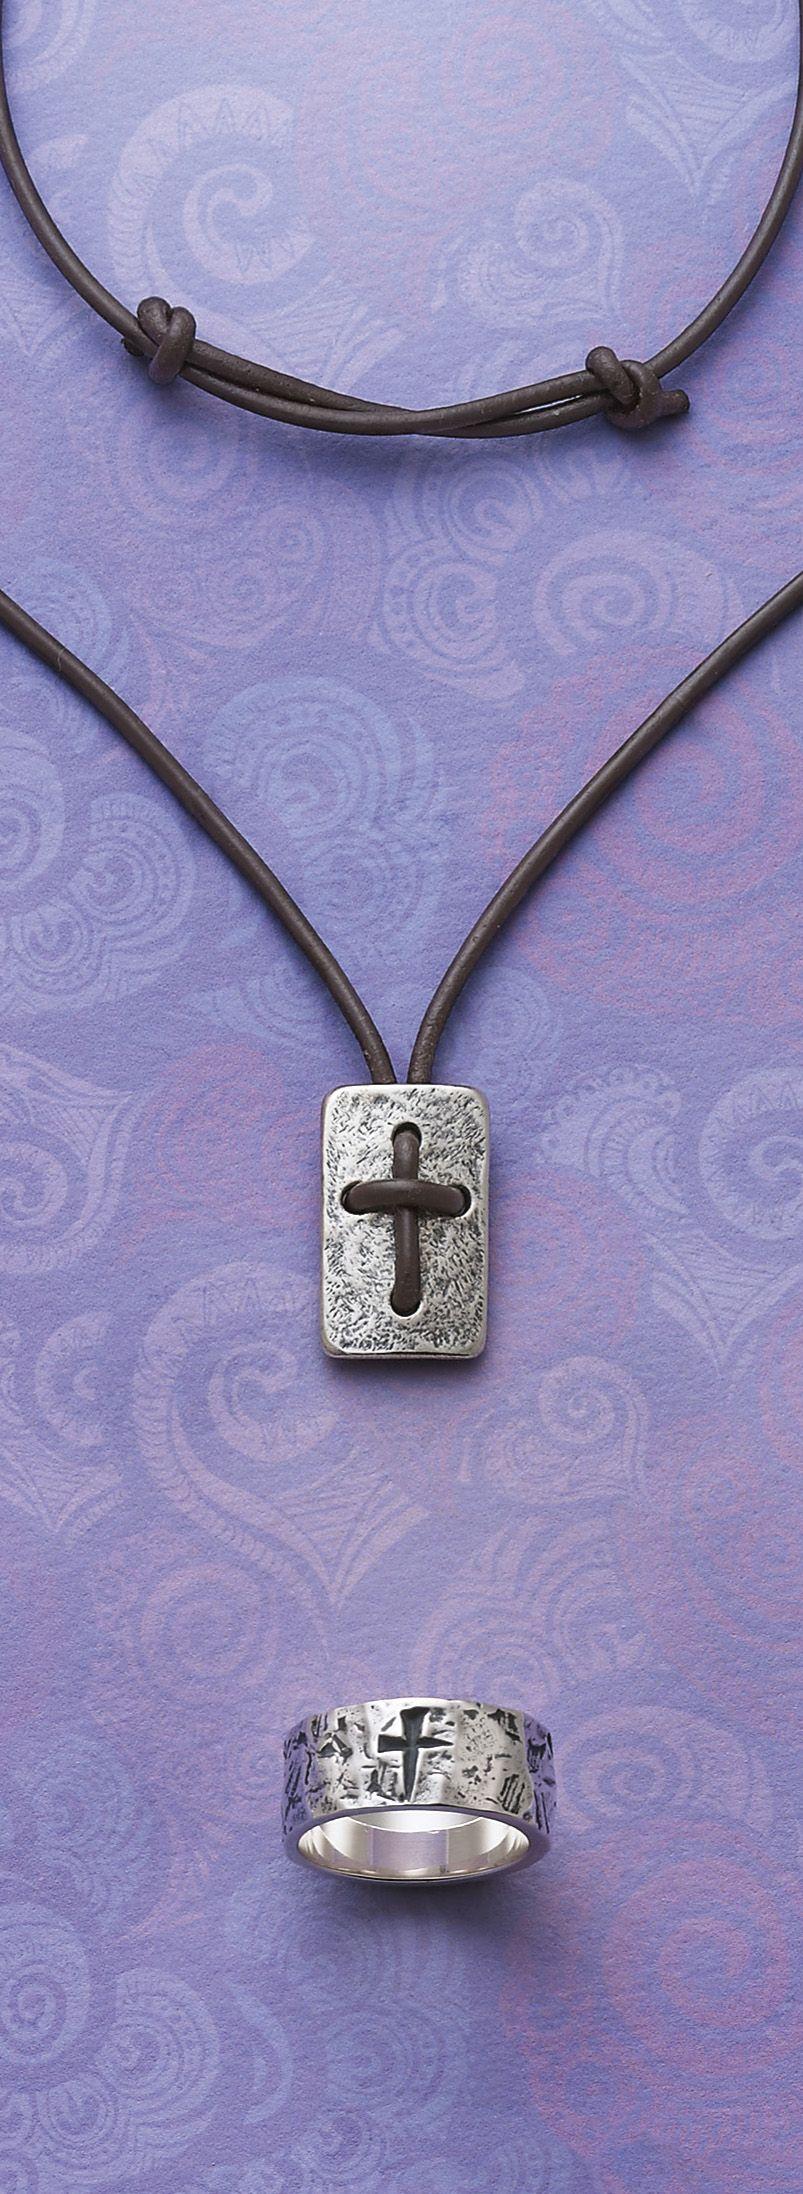 Leather Cross Shield Necklace Symbols Of Faith Cross